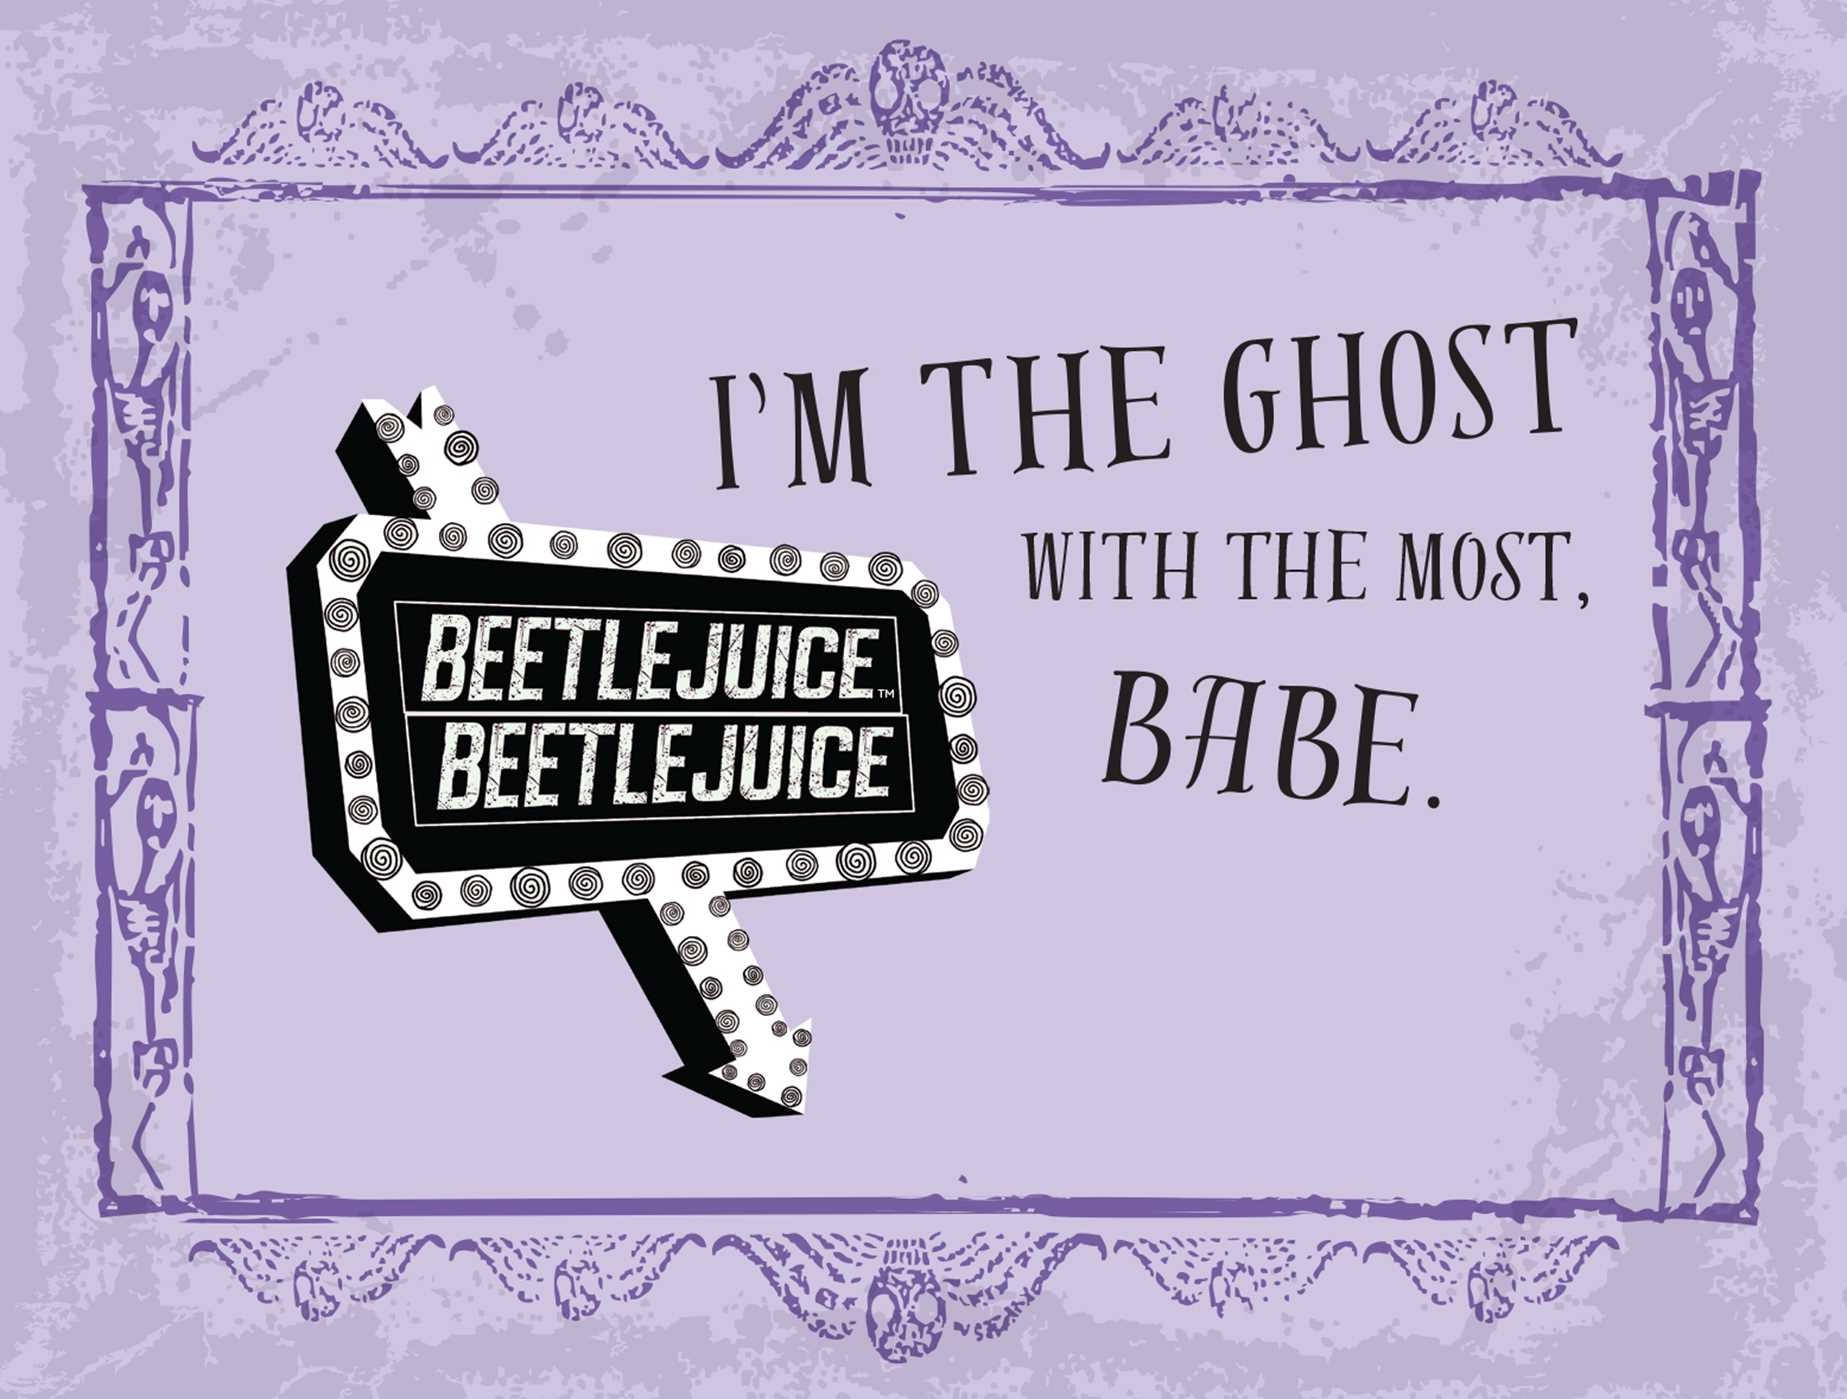 Beetlejuice handbook for the recently deceased deluxe note card set with keepsake book box 9781683833406.in05